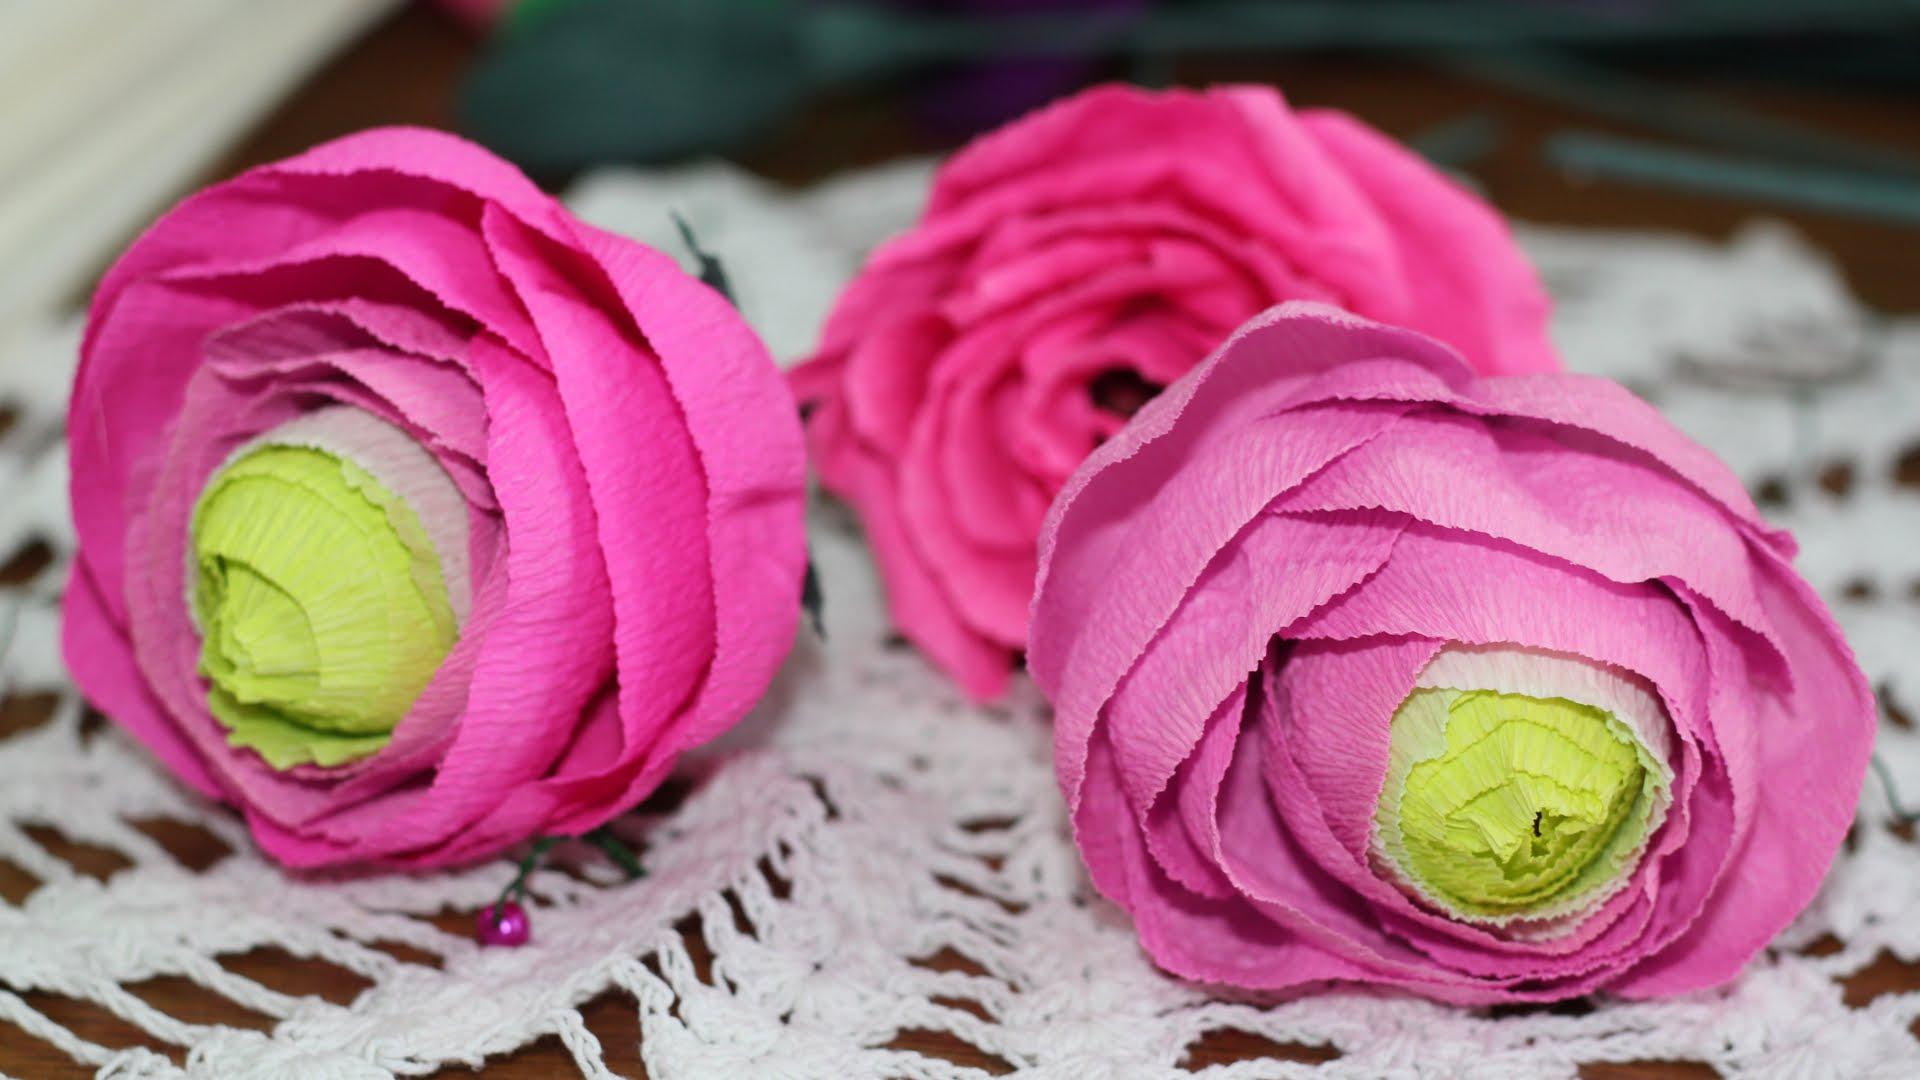 Ранункулюсы. Цветы из бумаги своими руками. Мастер-класс и шаблон